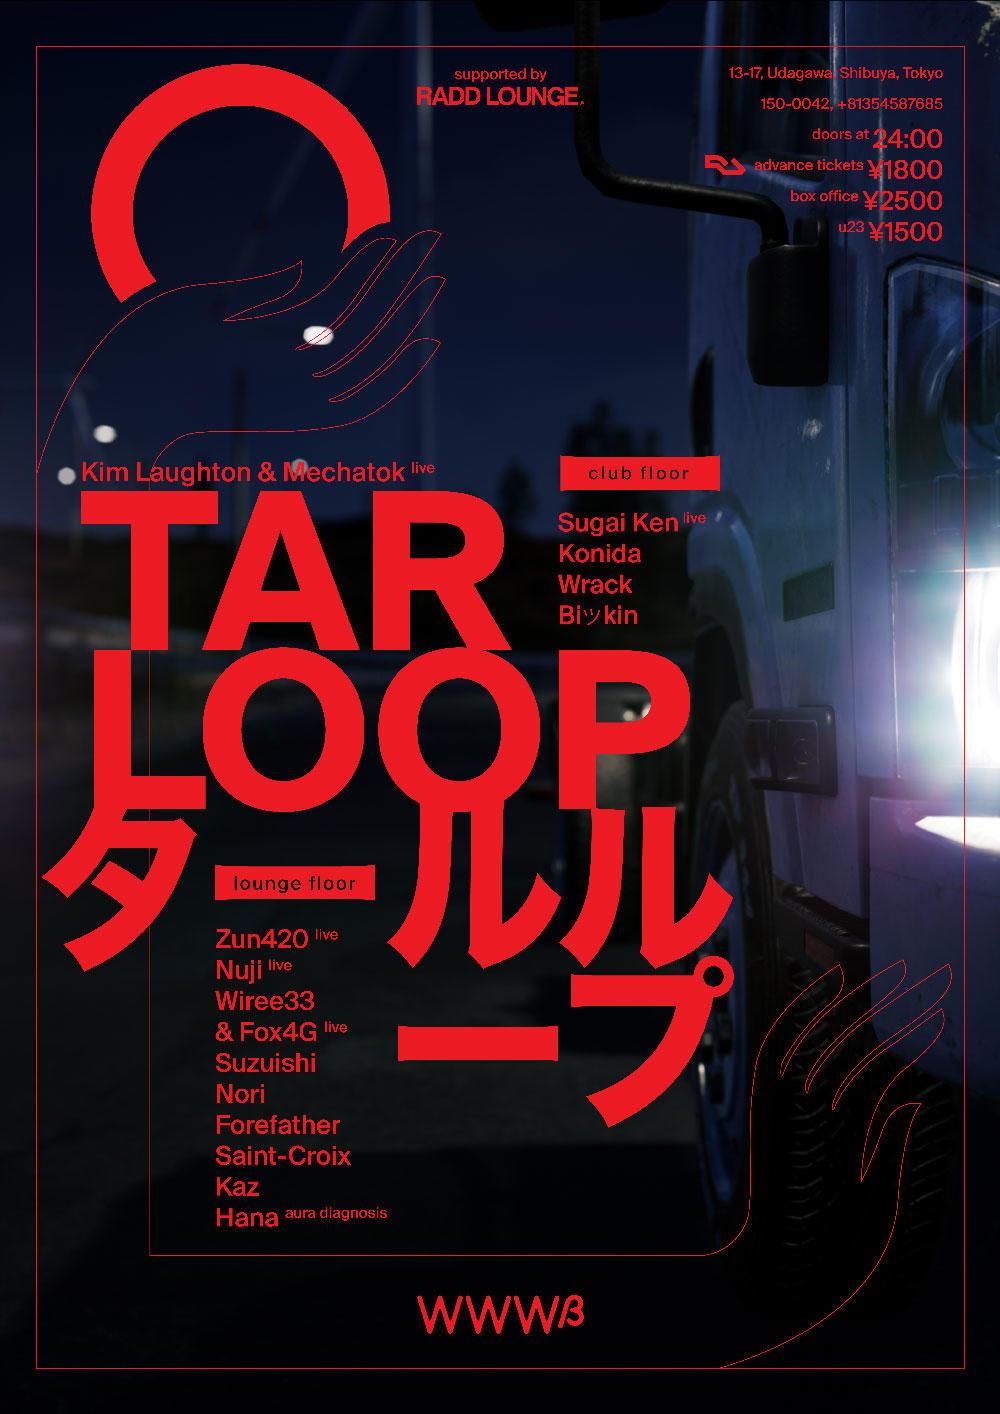 Kim Laughton & Mechatok / SUGAI KEN / KONIDA / WRACK / BIッKIN / and more